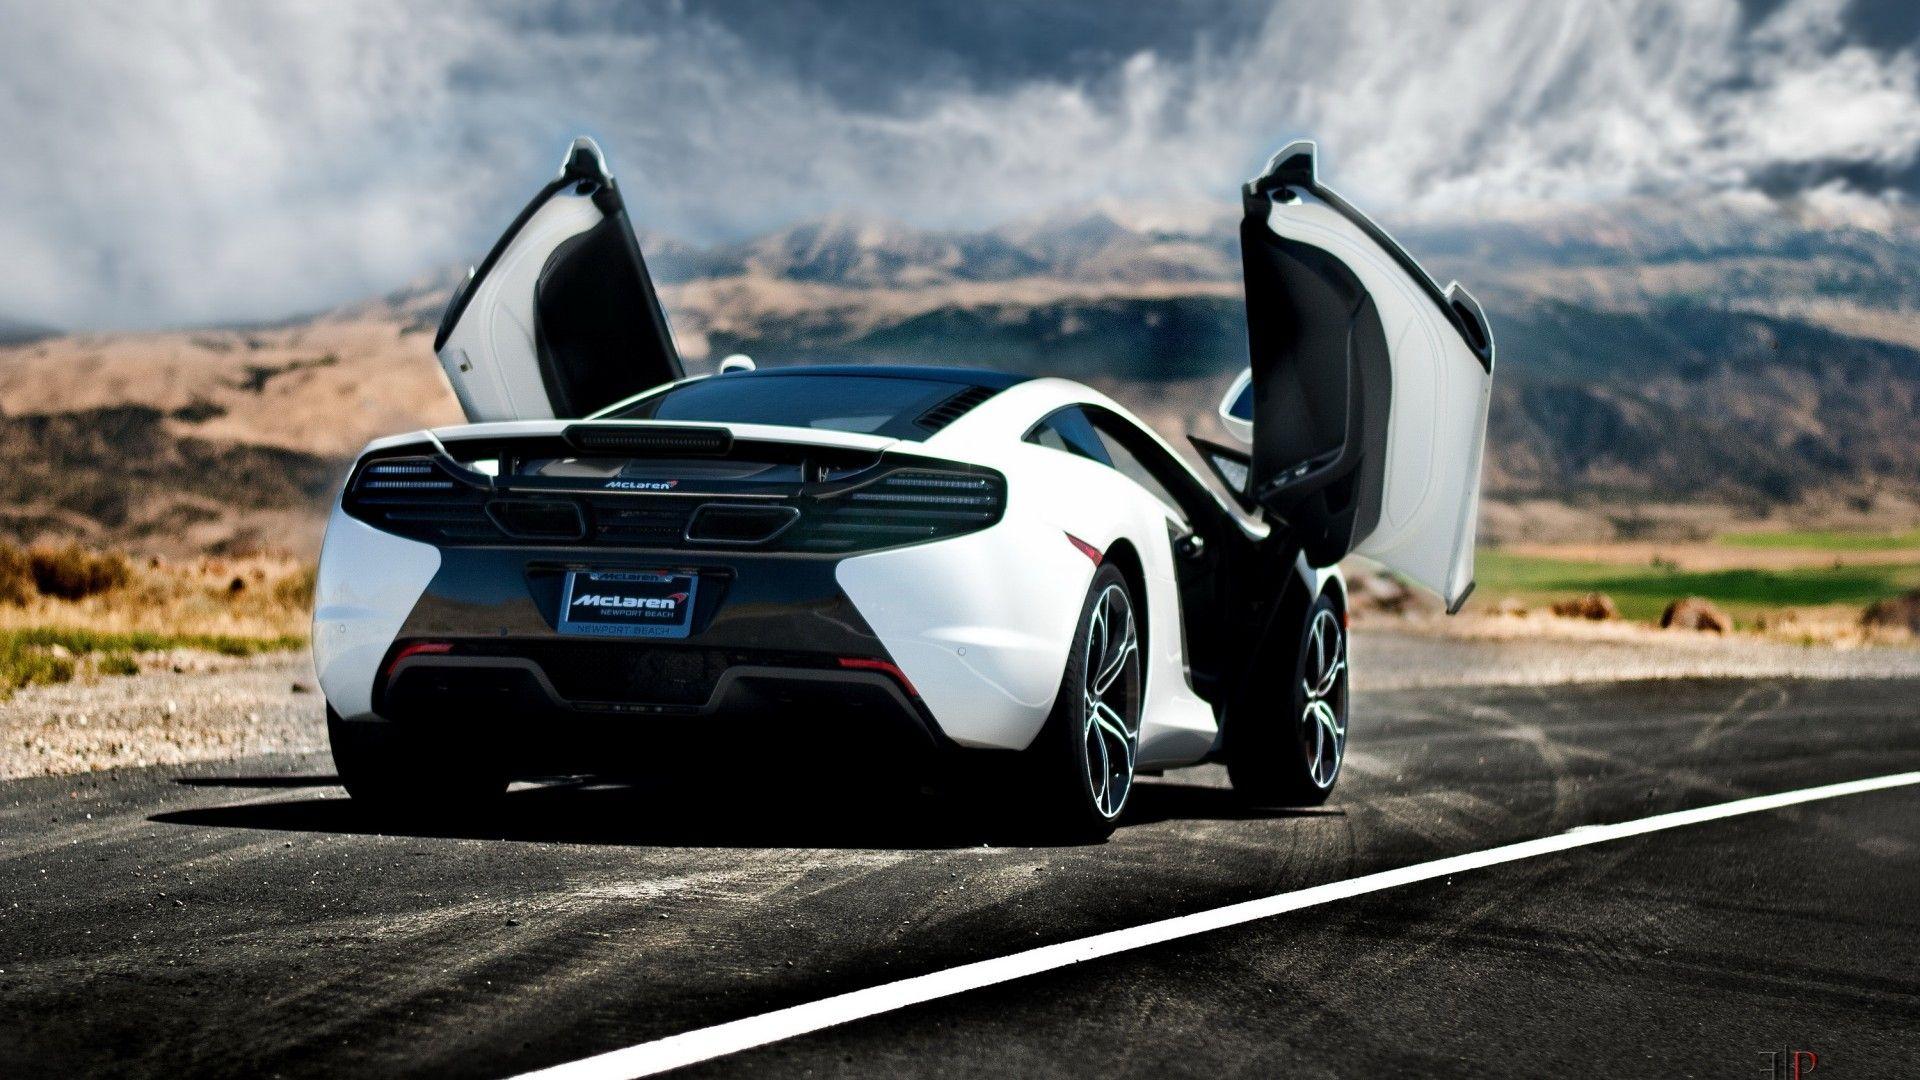 Car Photo desktop image